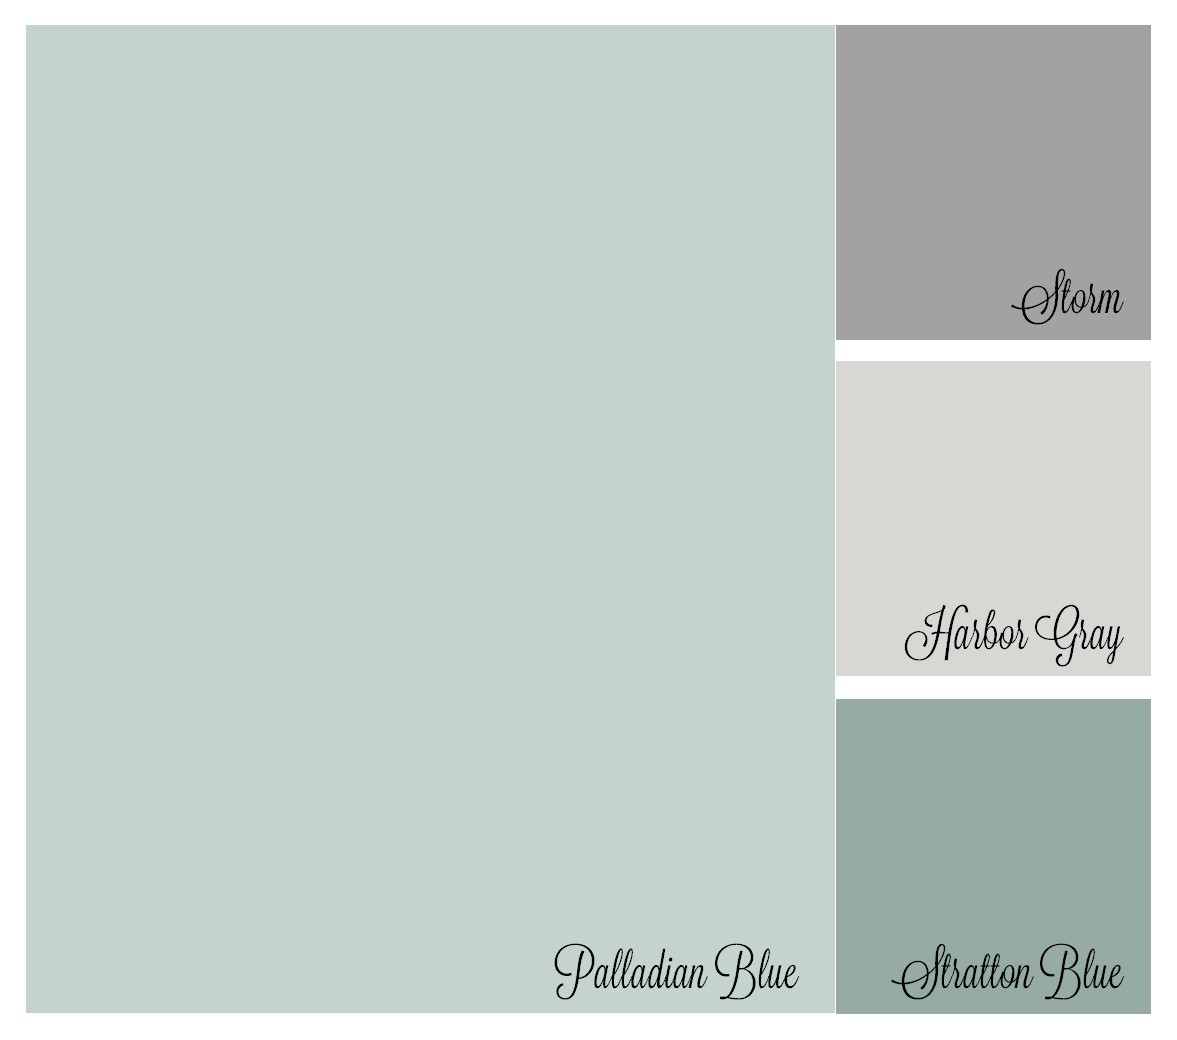 color palette benjamin moore palladian blue storm harboy gray stratton blue